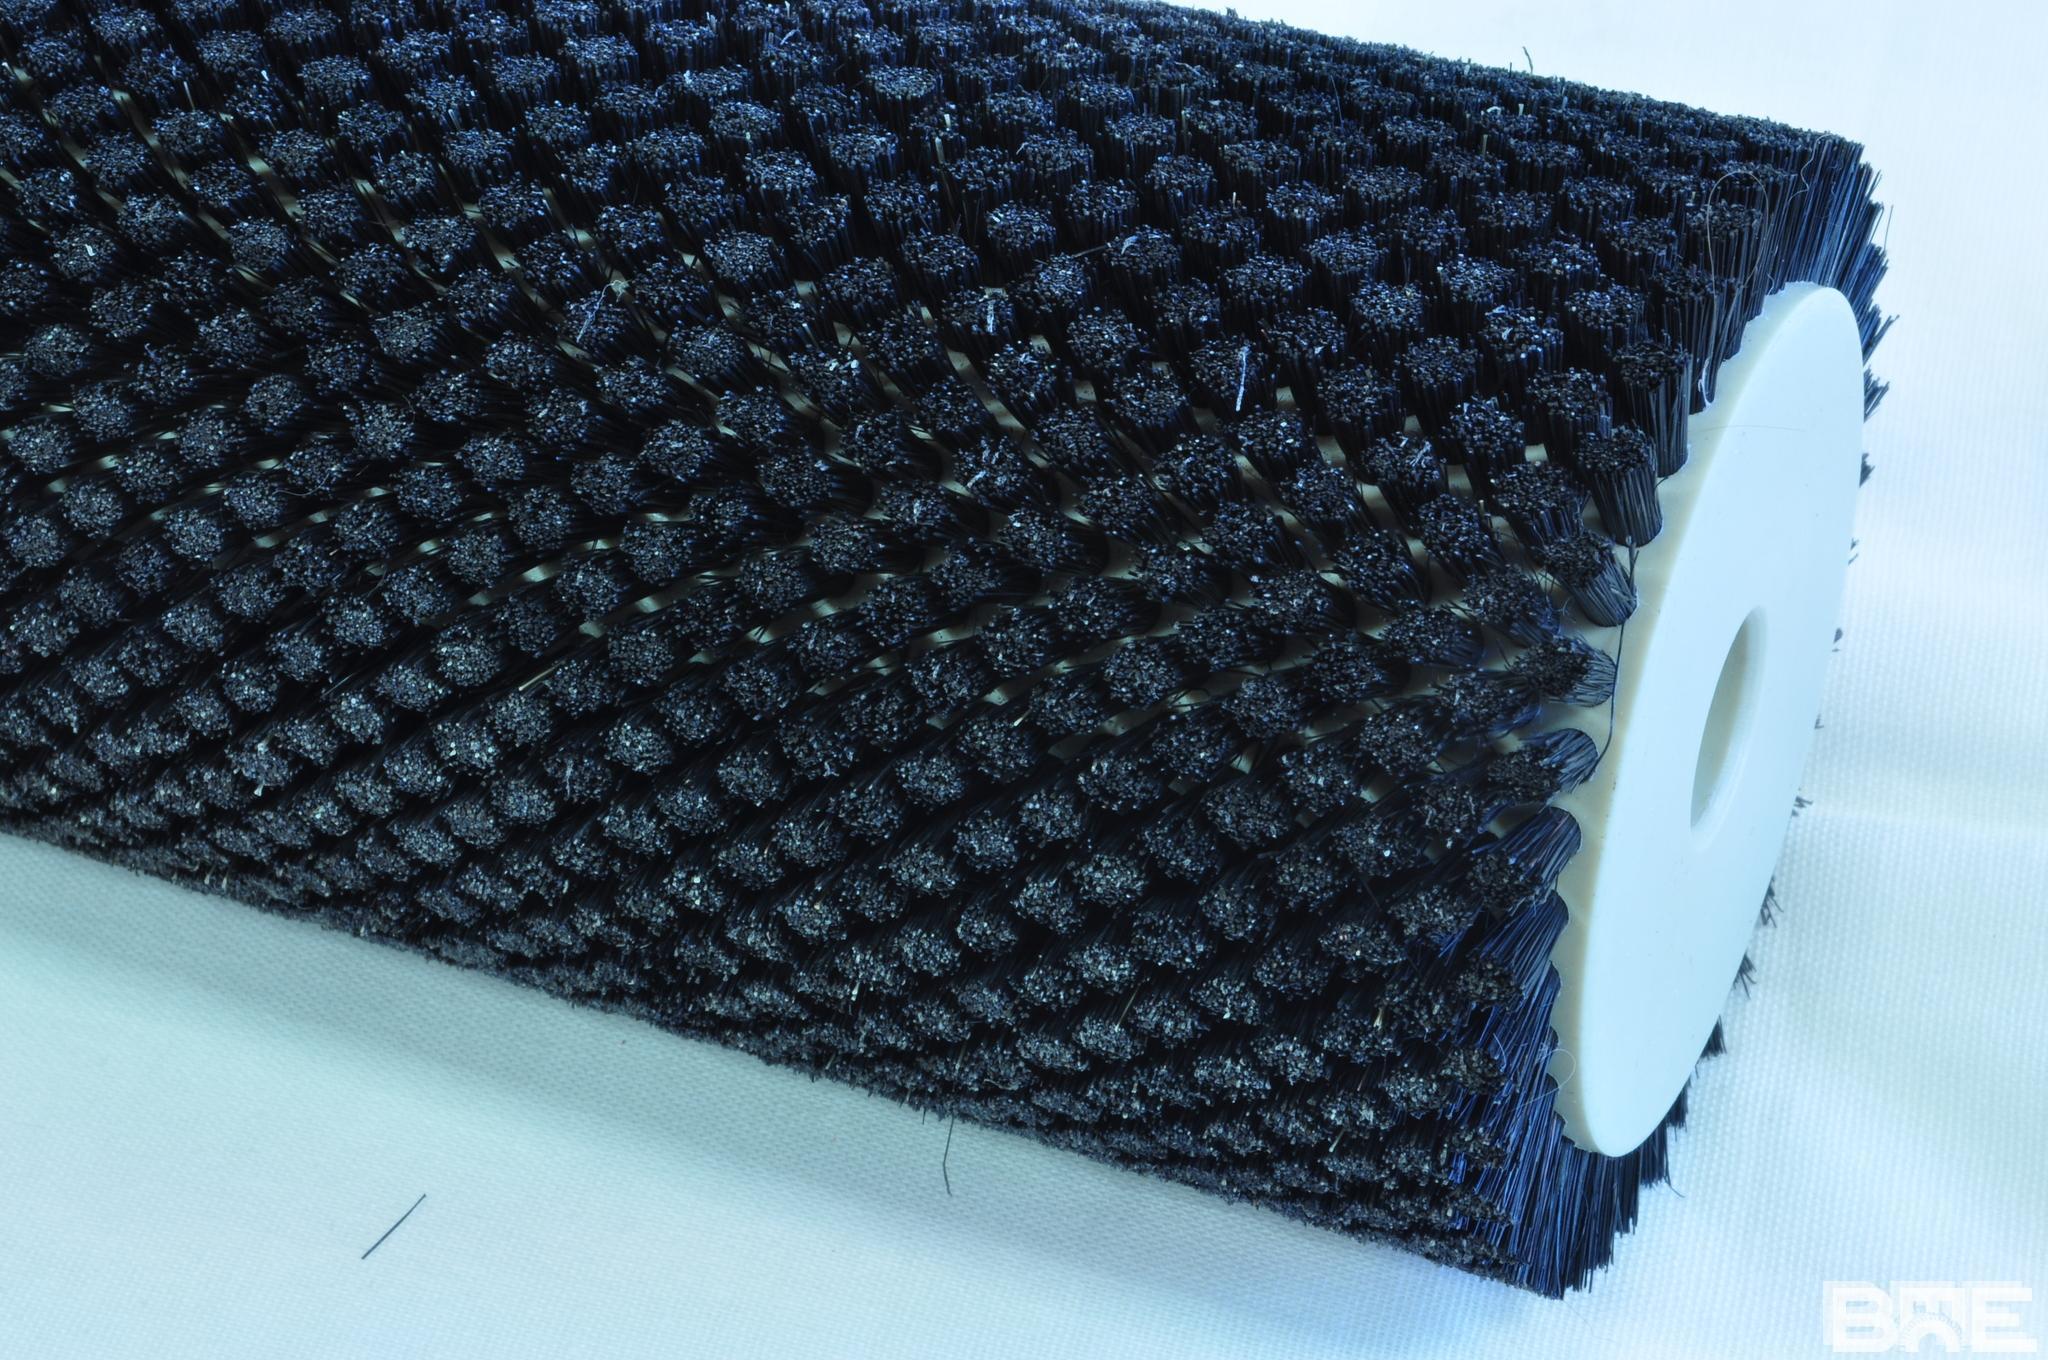 Brosse rotative antistatique avec garnissage en soie naturelle